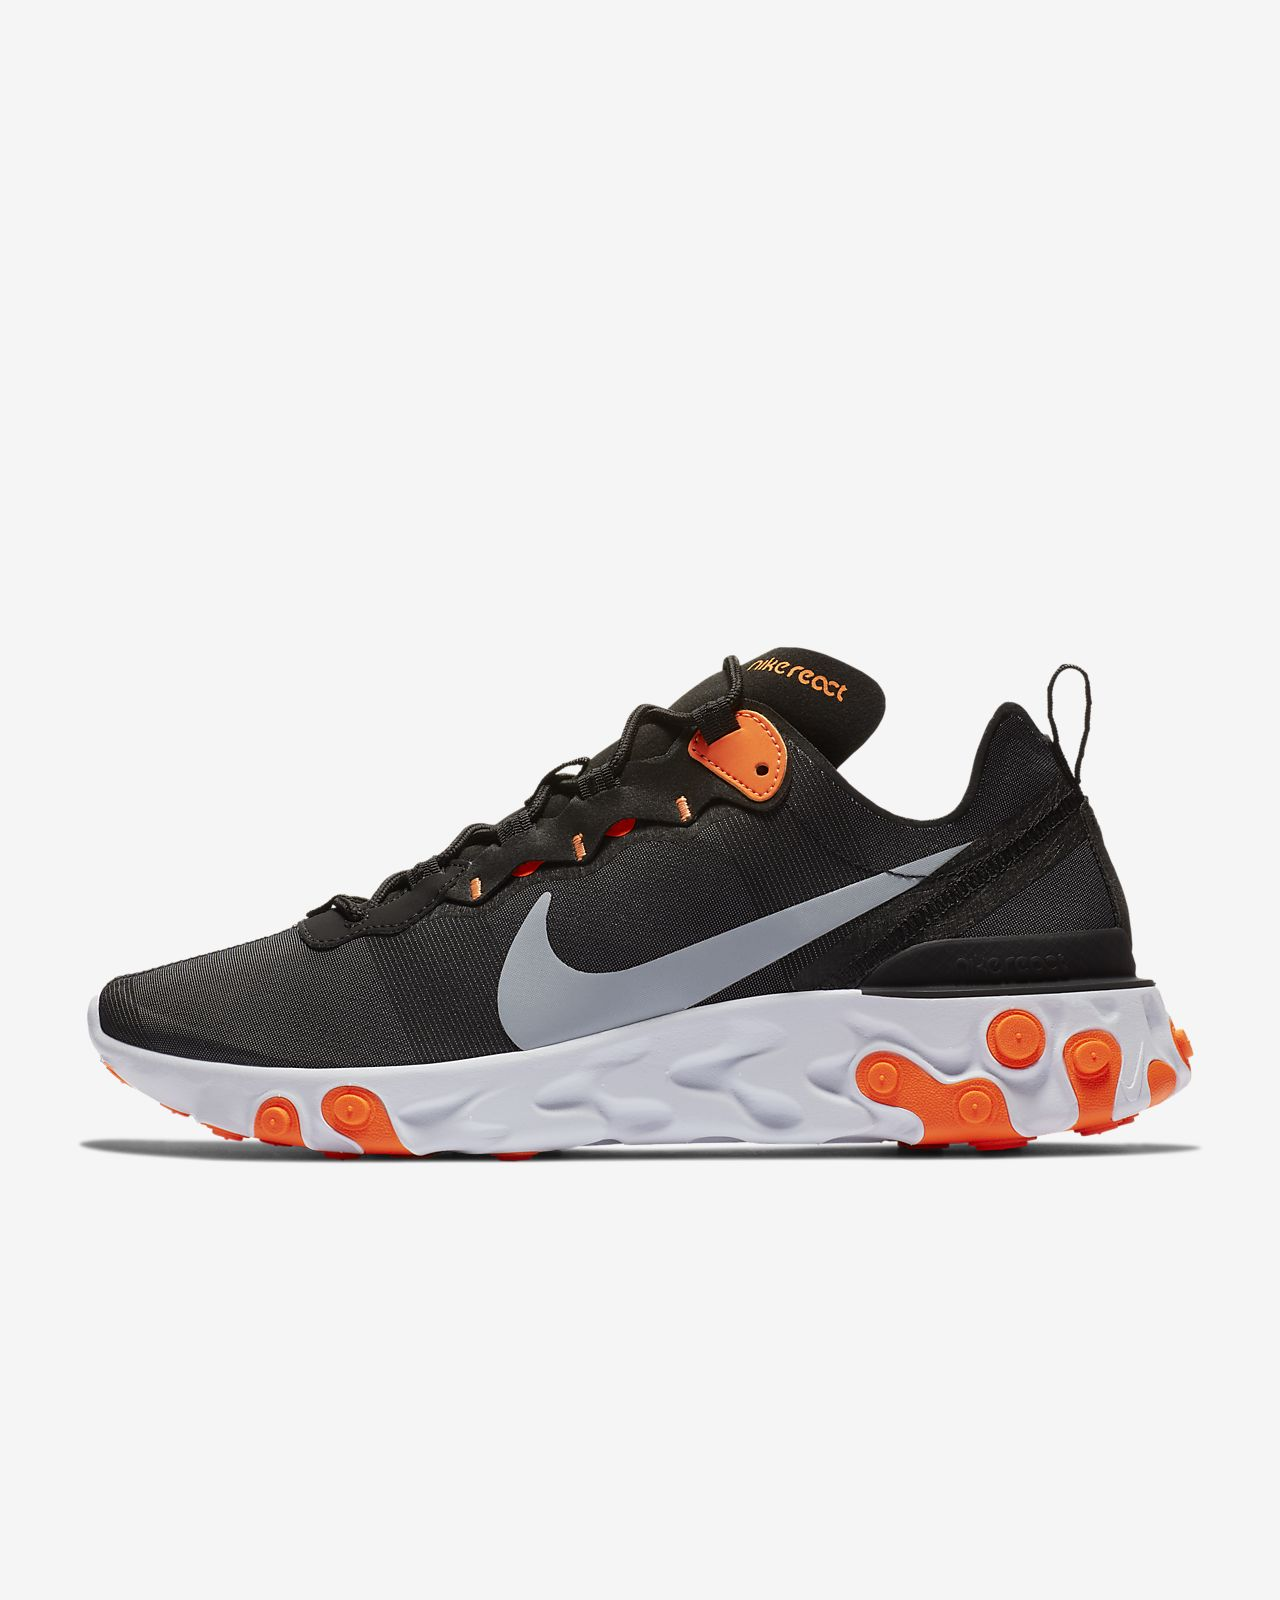 nike 2019 scarpe